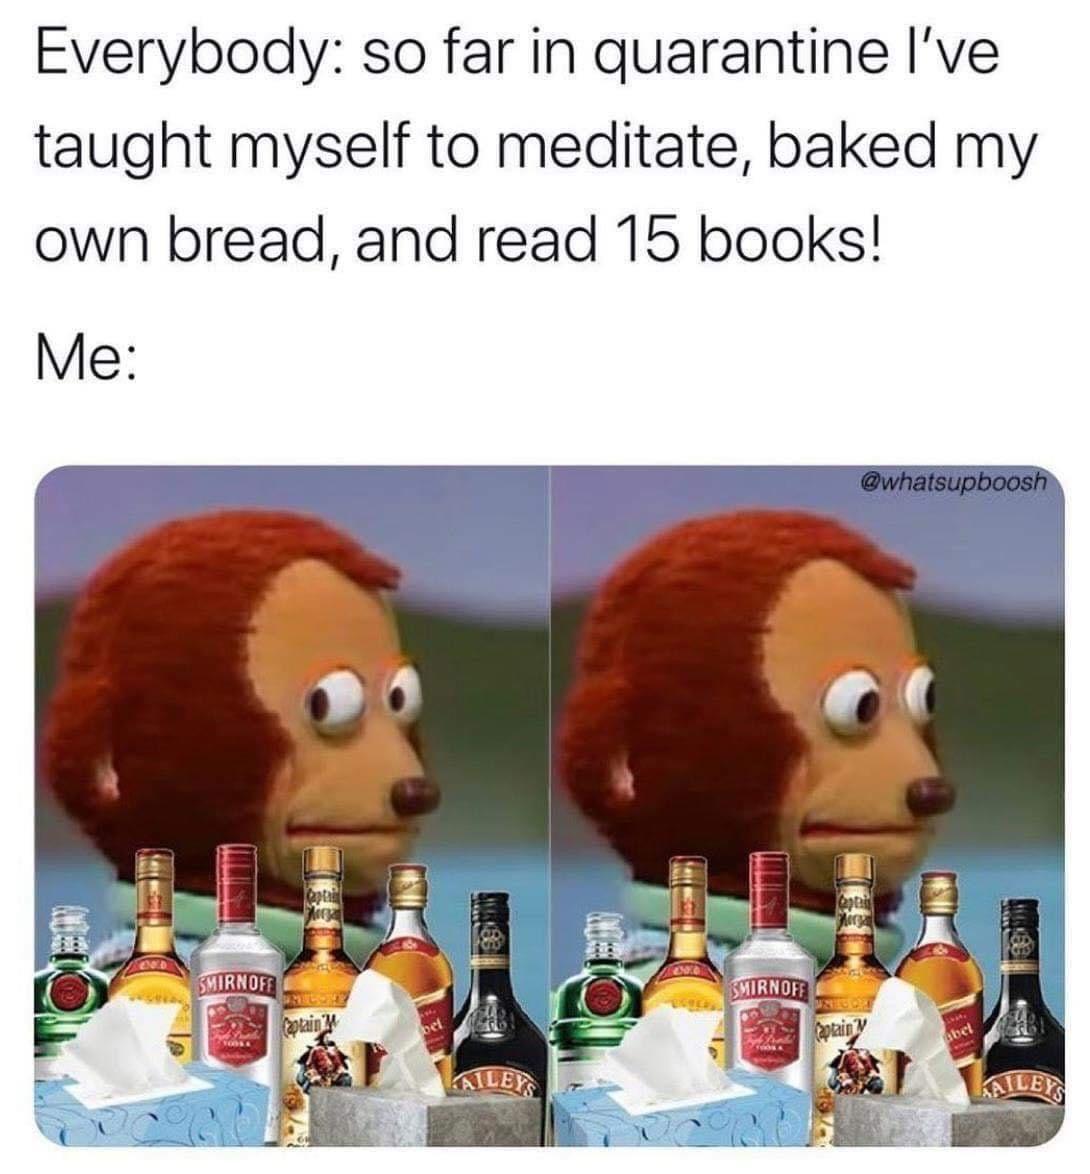 Pin By Dawnieheather On 2020 2021 Funny School Memes Me Too Meme Memes